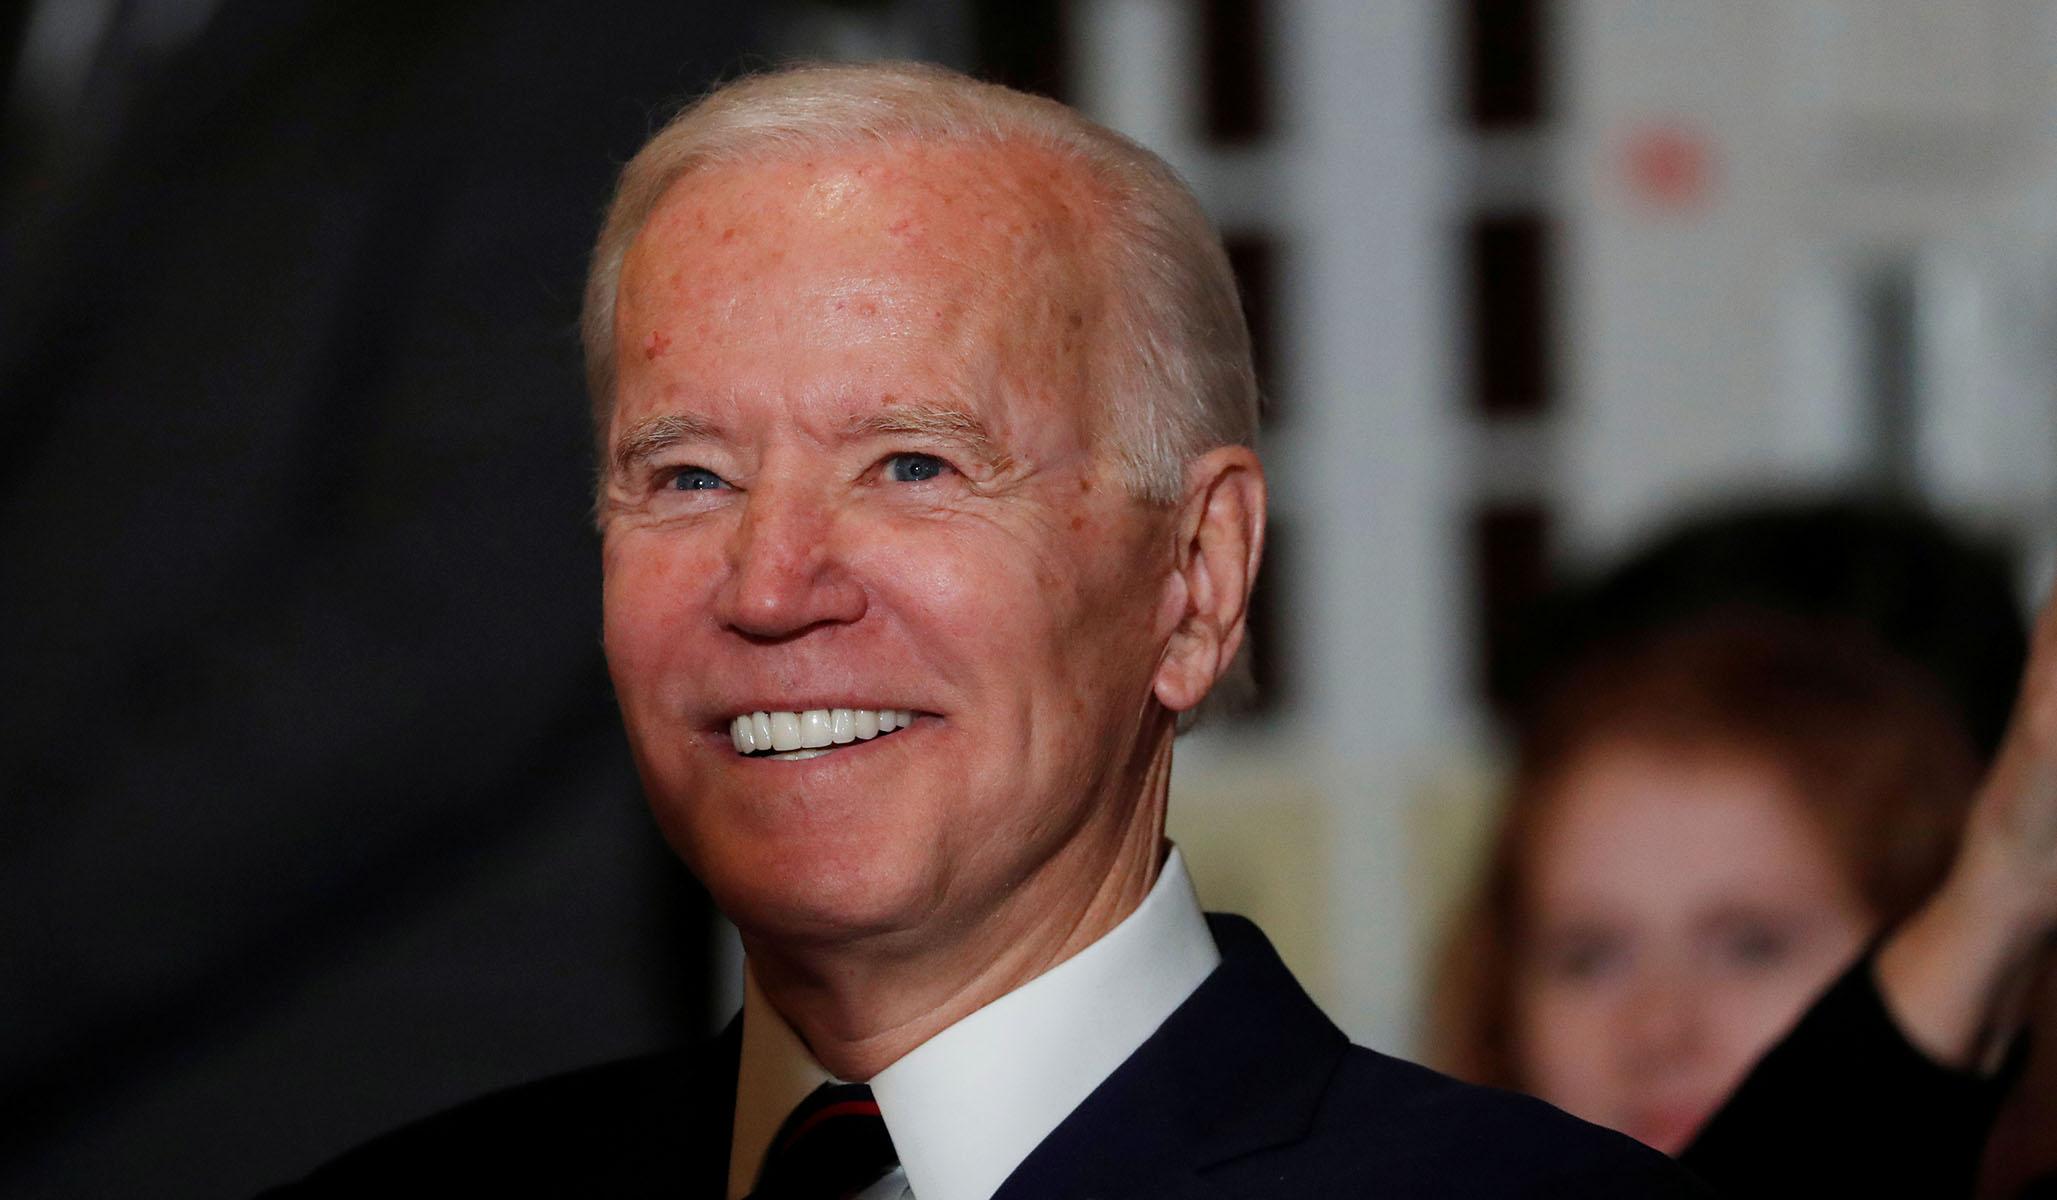 What Happens If Joe Biden Ends Up Winning the Iowa Caucuses?